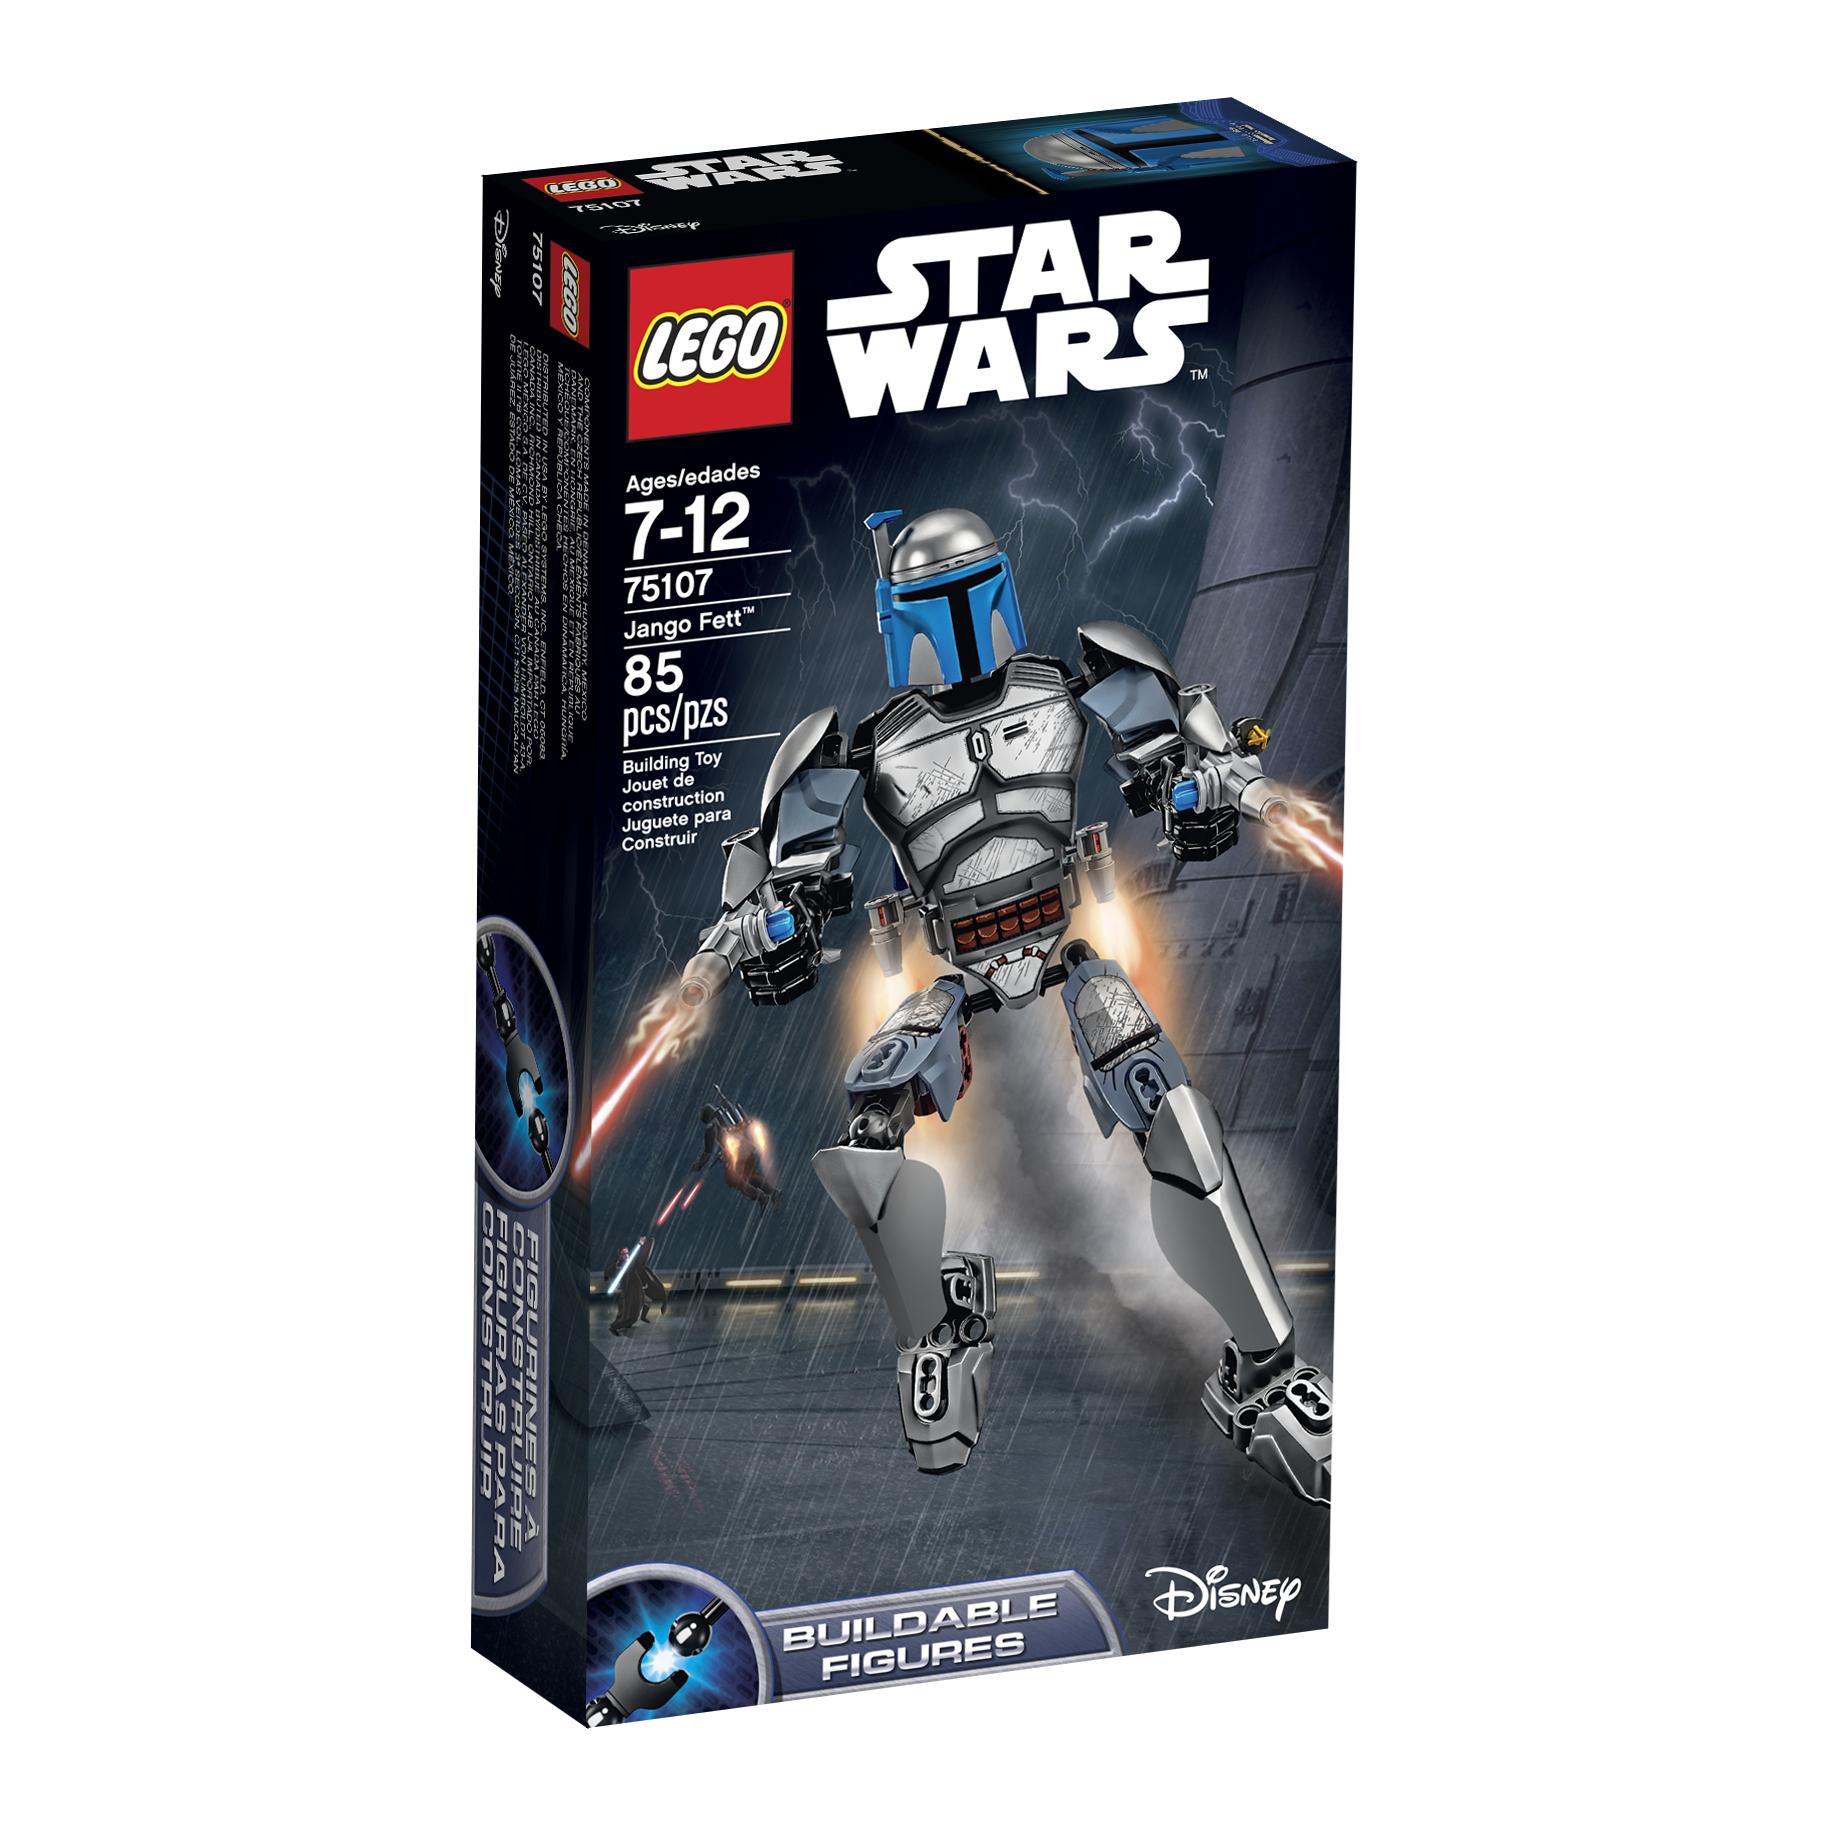 LEGO Star Wars Jango Fett 75107 $13.99 at Walmart and Amazon